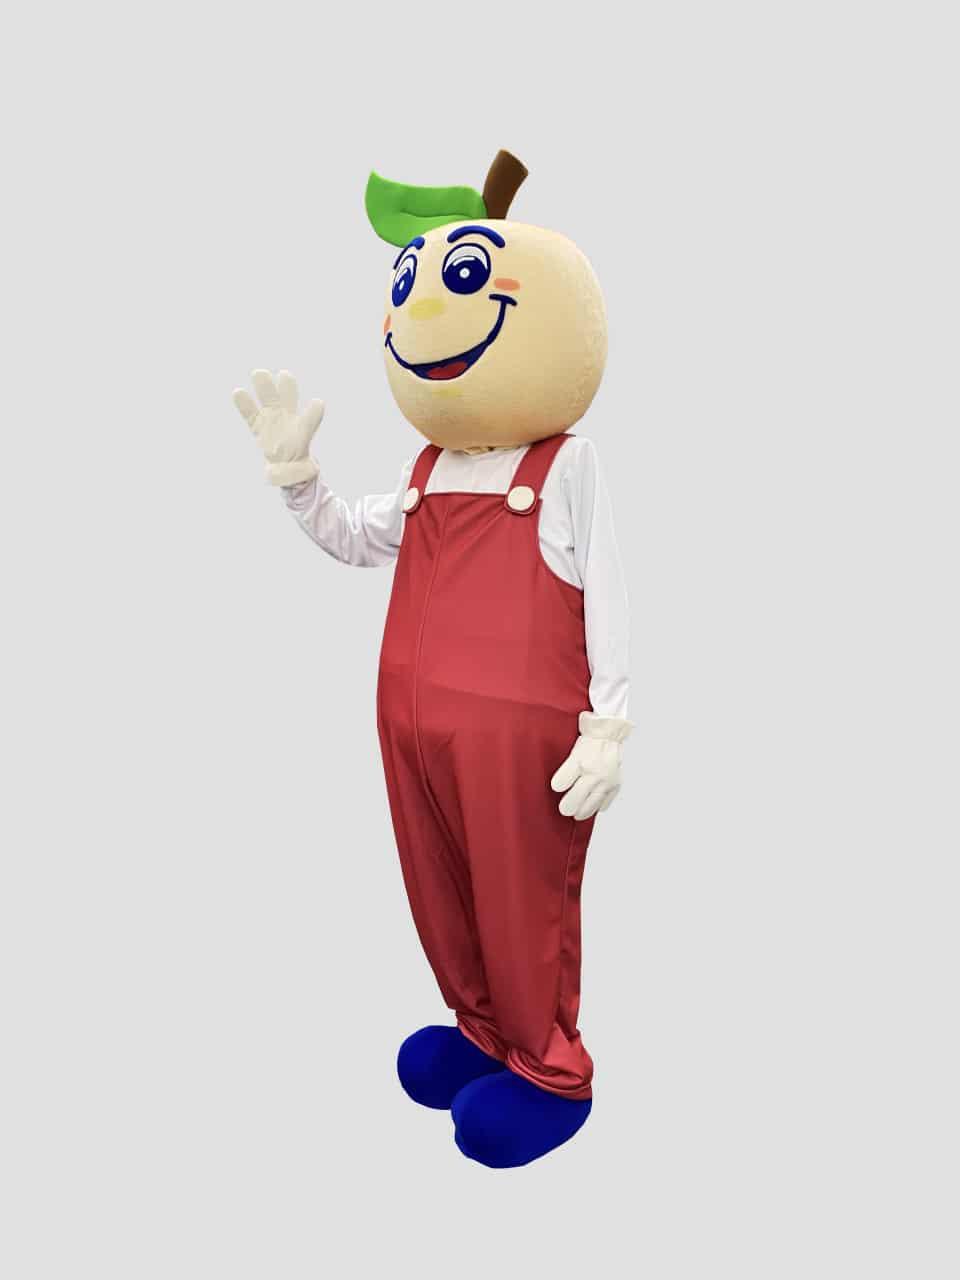 peach mascot costume